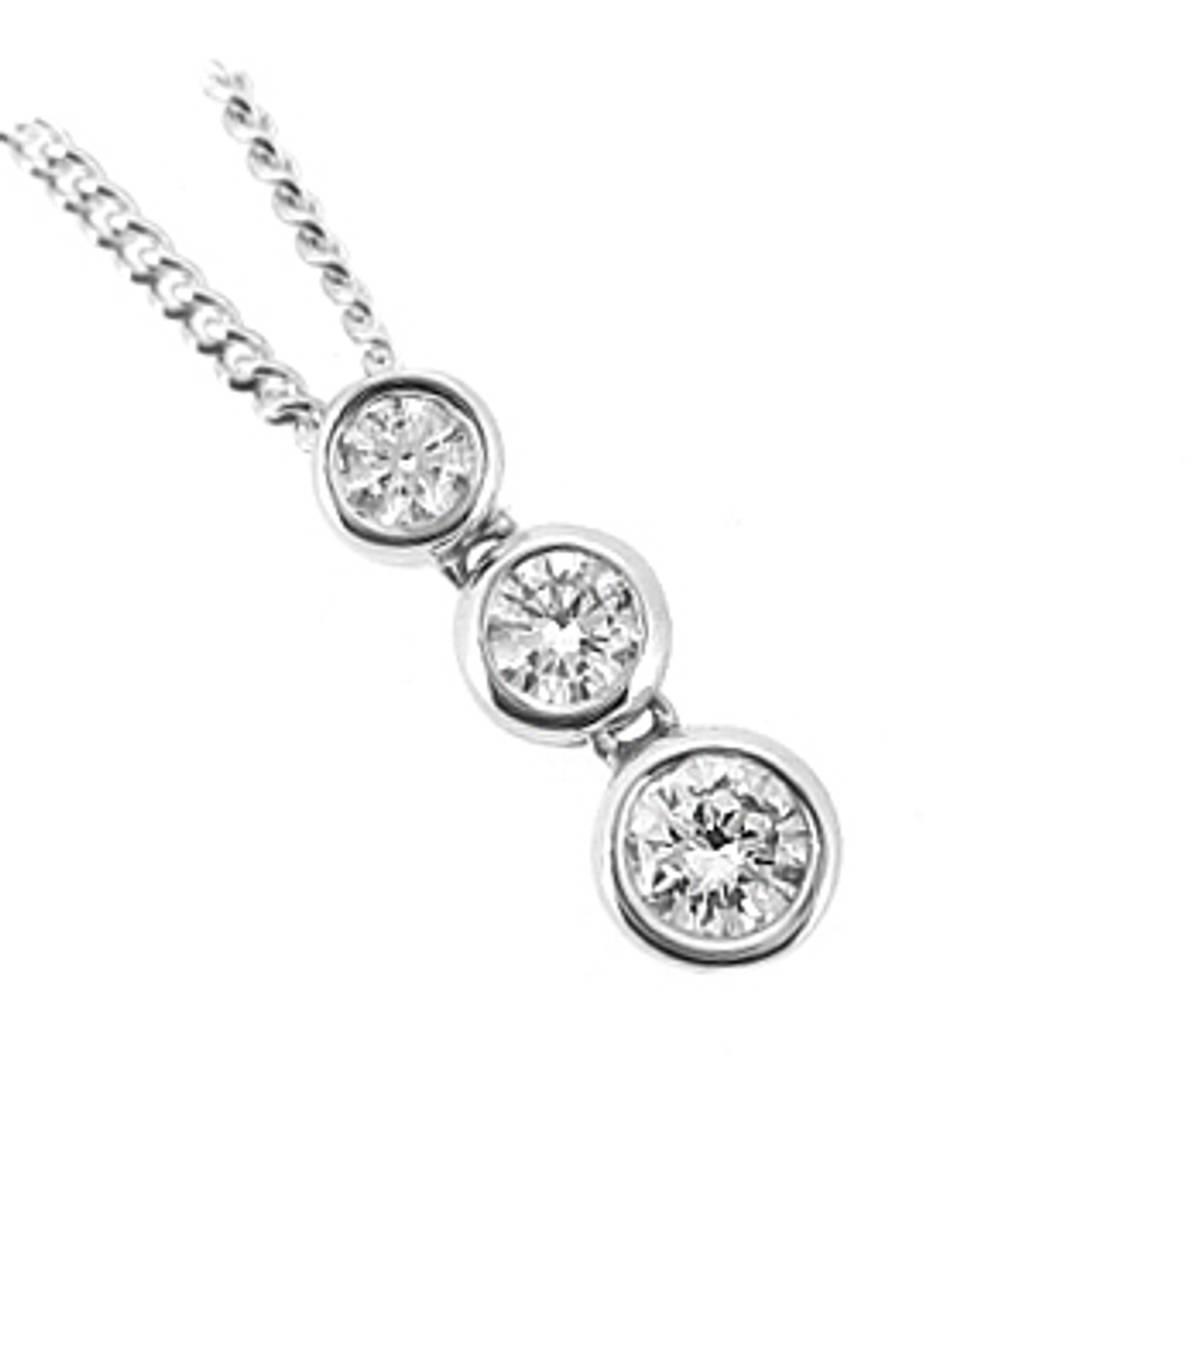 DP38353 stone diamond rubover set drop pendantPictured item: total 0.49ct brilliant cut diamond set in 18k white goldAvailable in: 18k gold